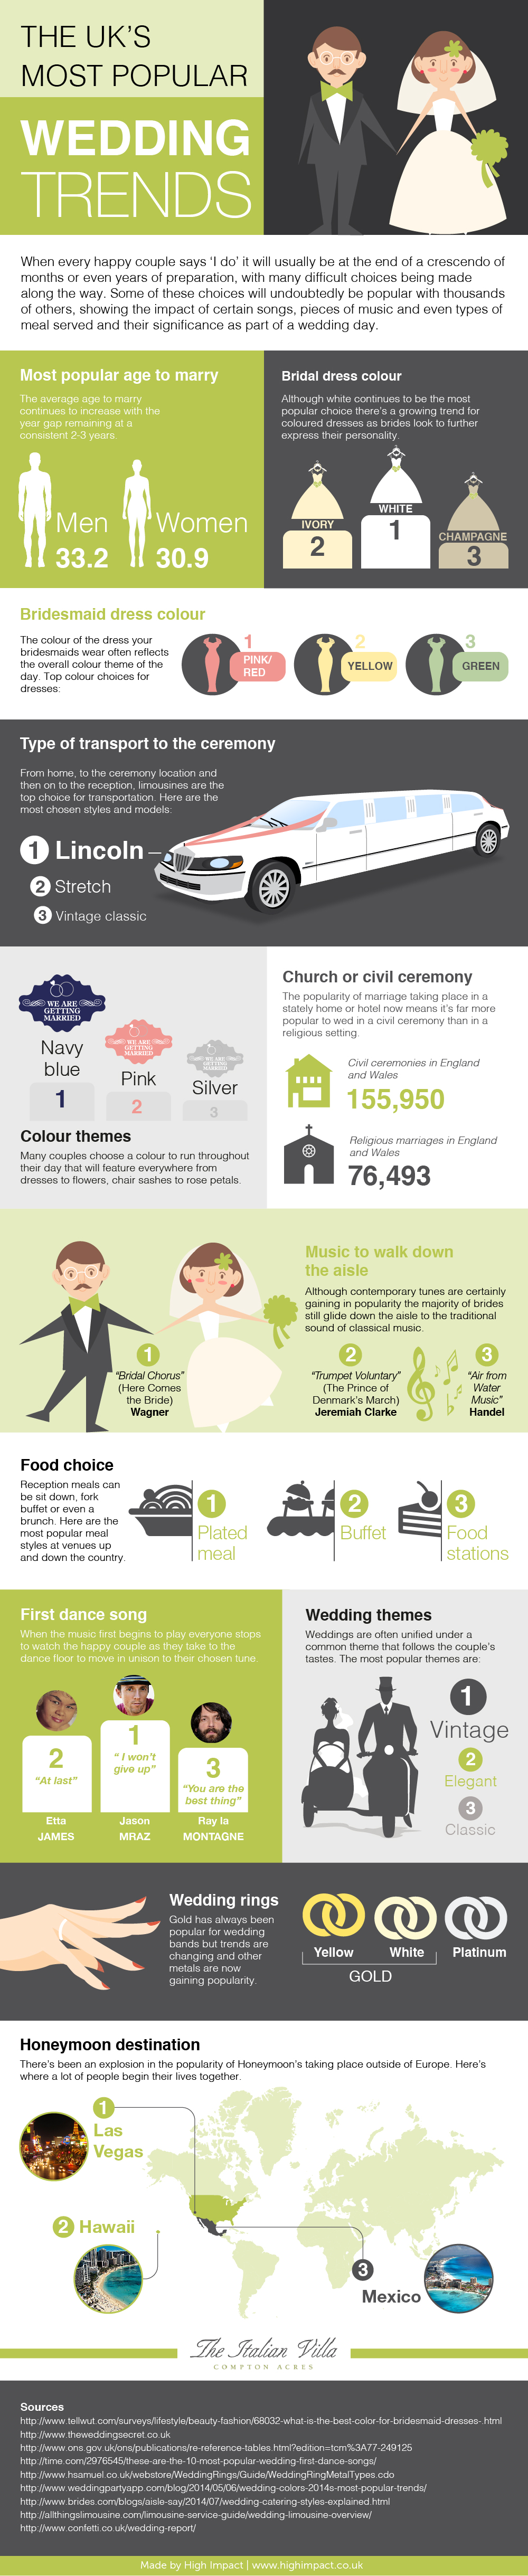 The UK's Most Popular Wedding Trends